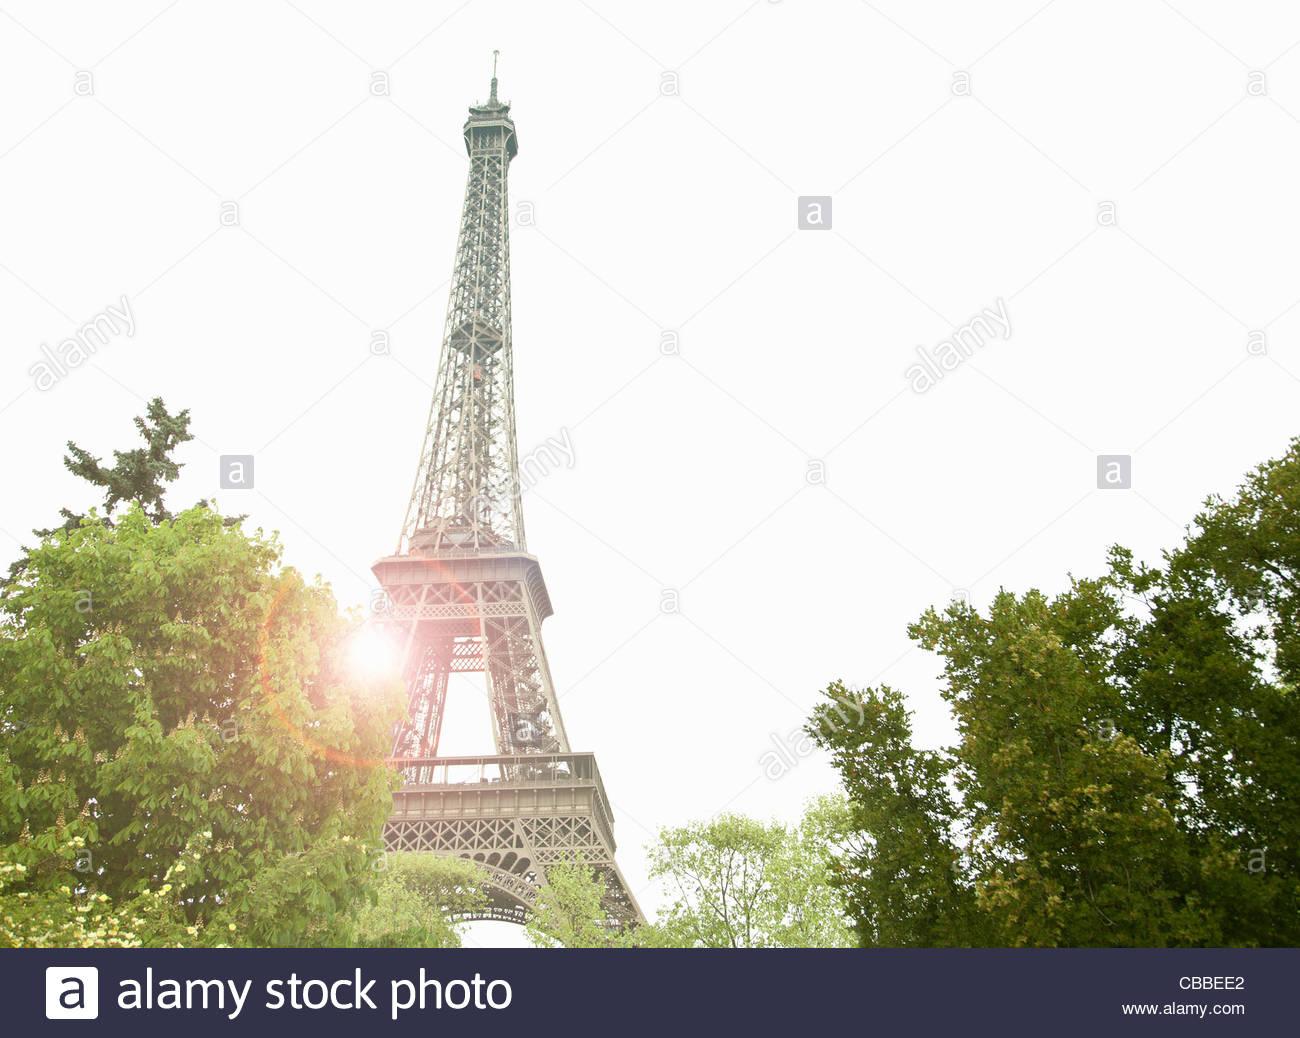 Eiffel Tower in Paris - Stock Image